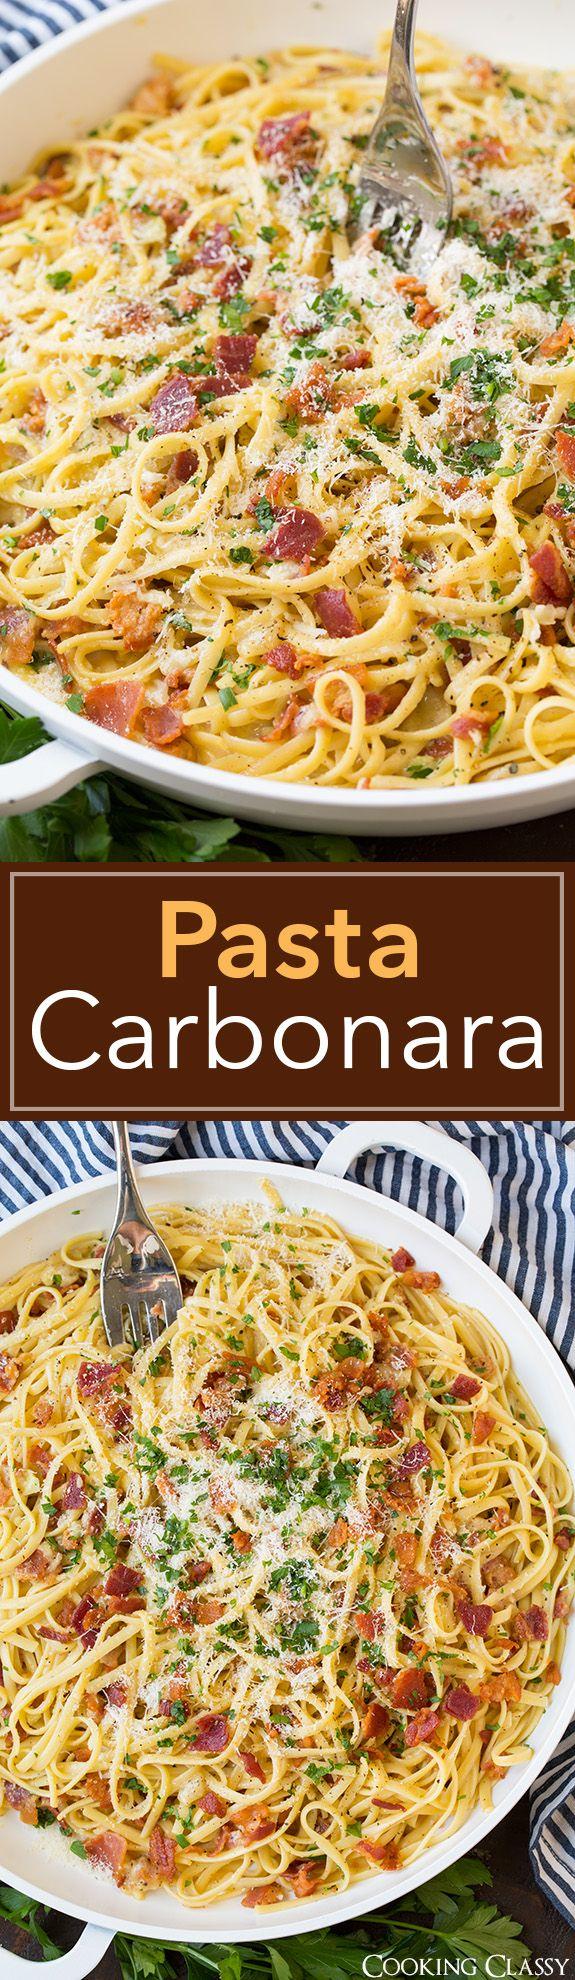 Pasta Carbonara - Cooking Classy